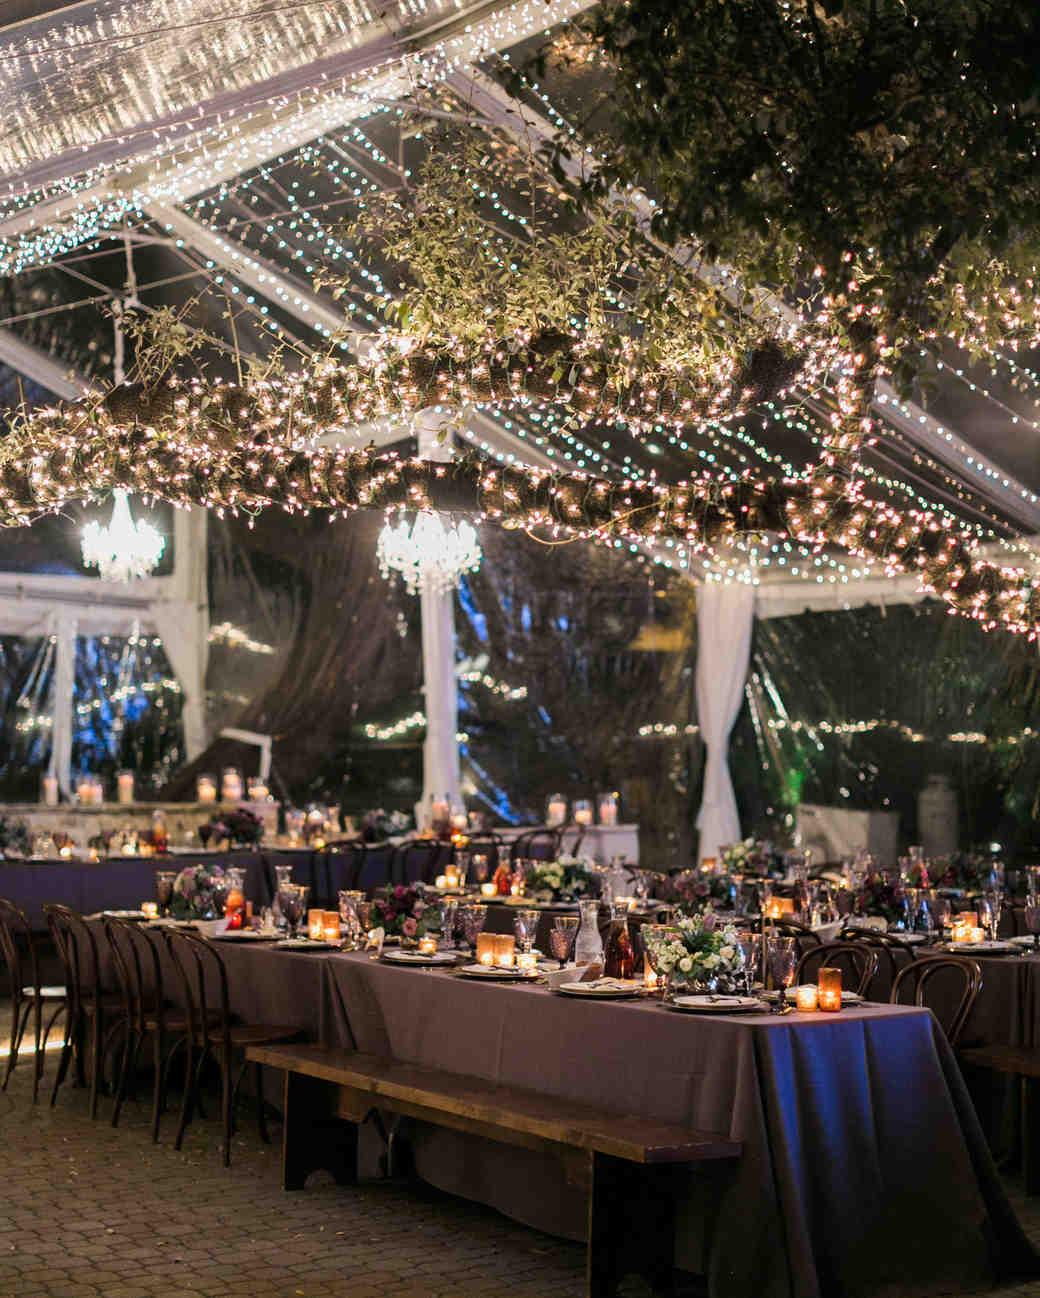 Wedding Reception Austin Tx: Stacey And Adam's Classic-Meets-Fun Austin Wedding